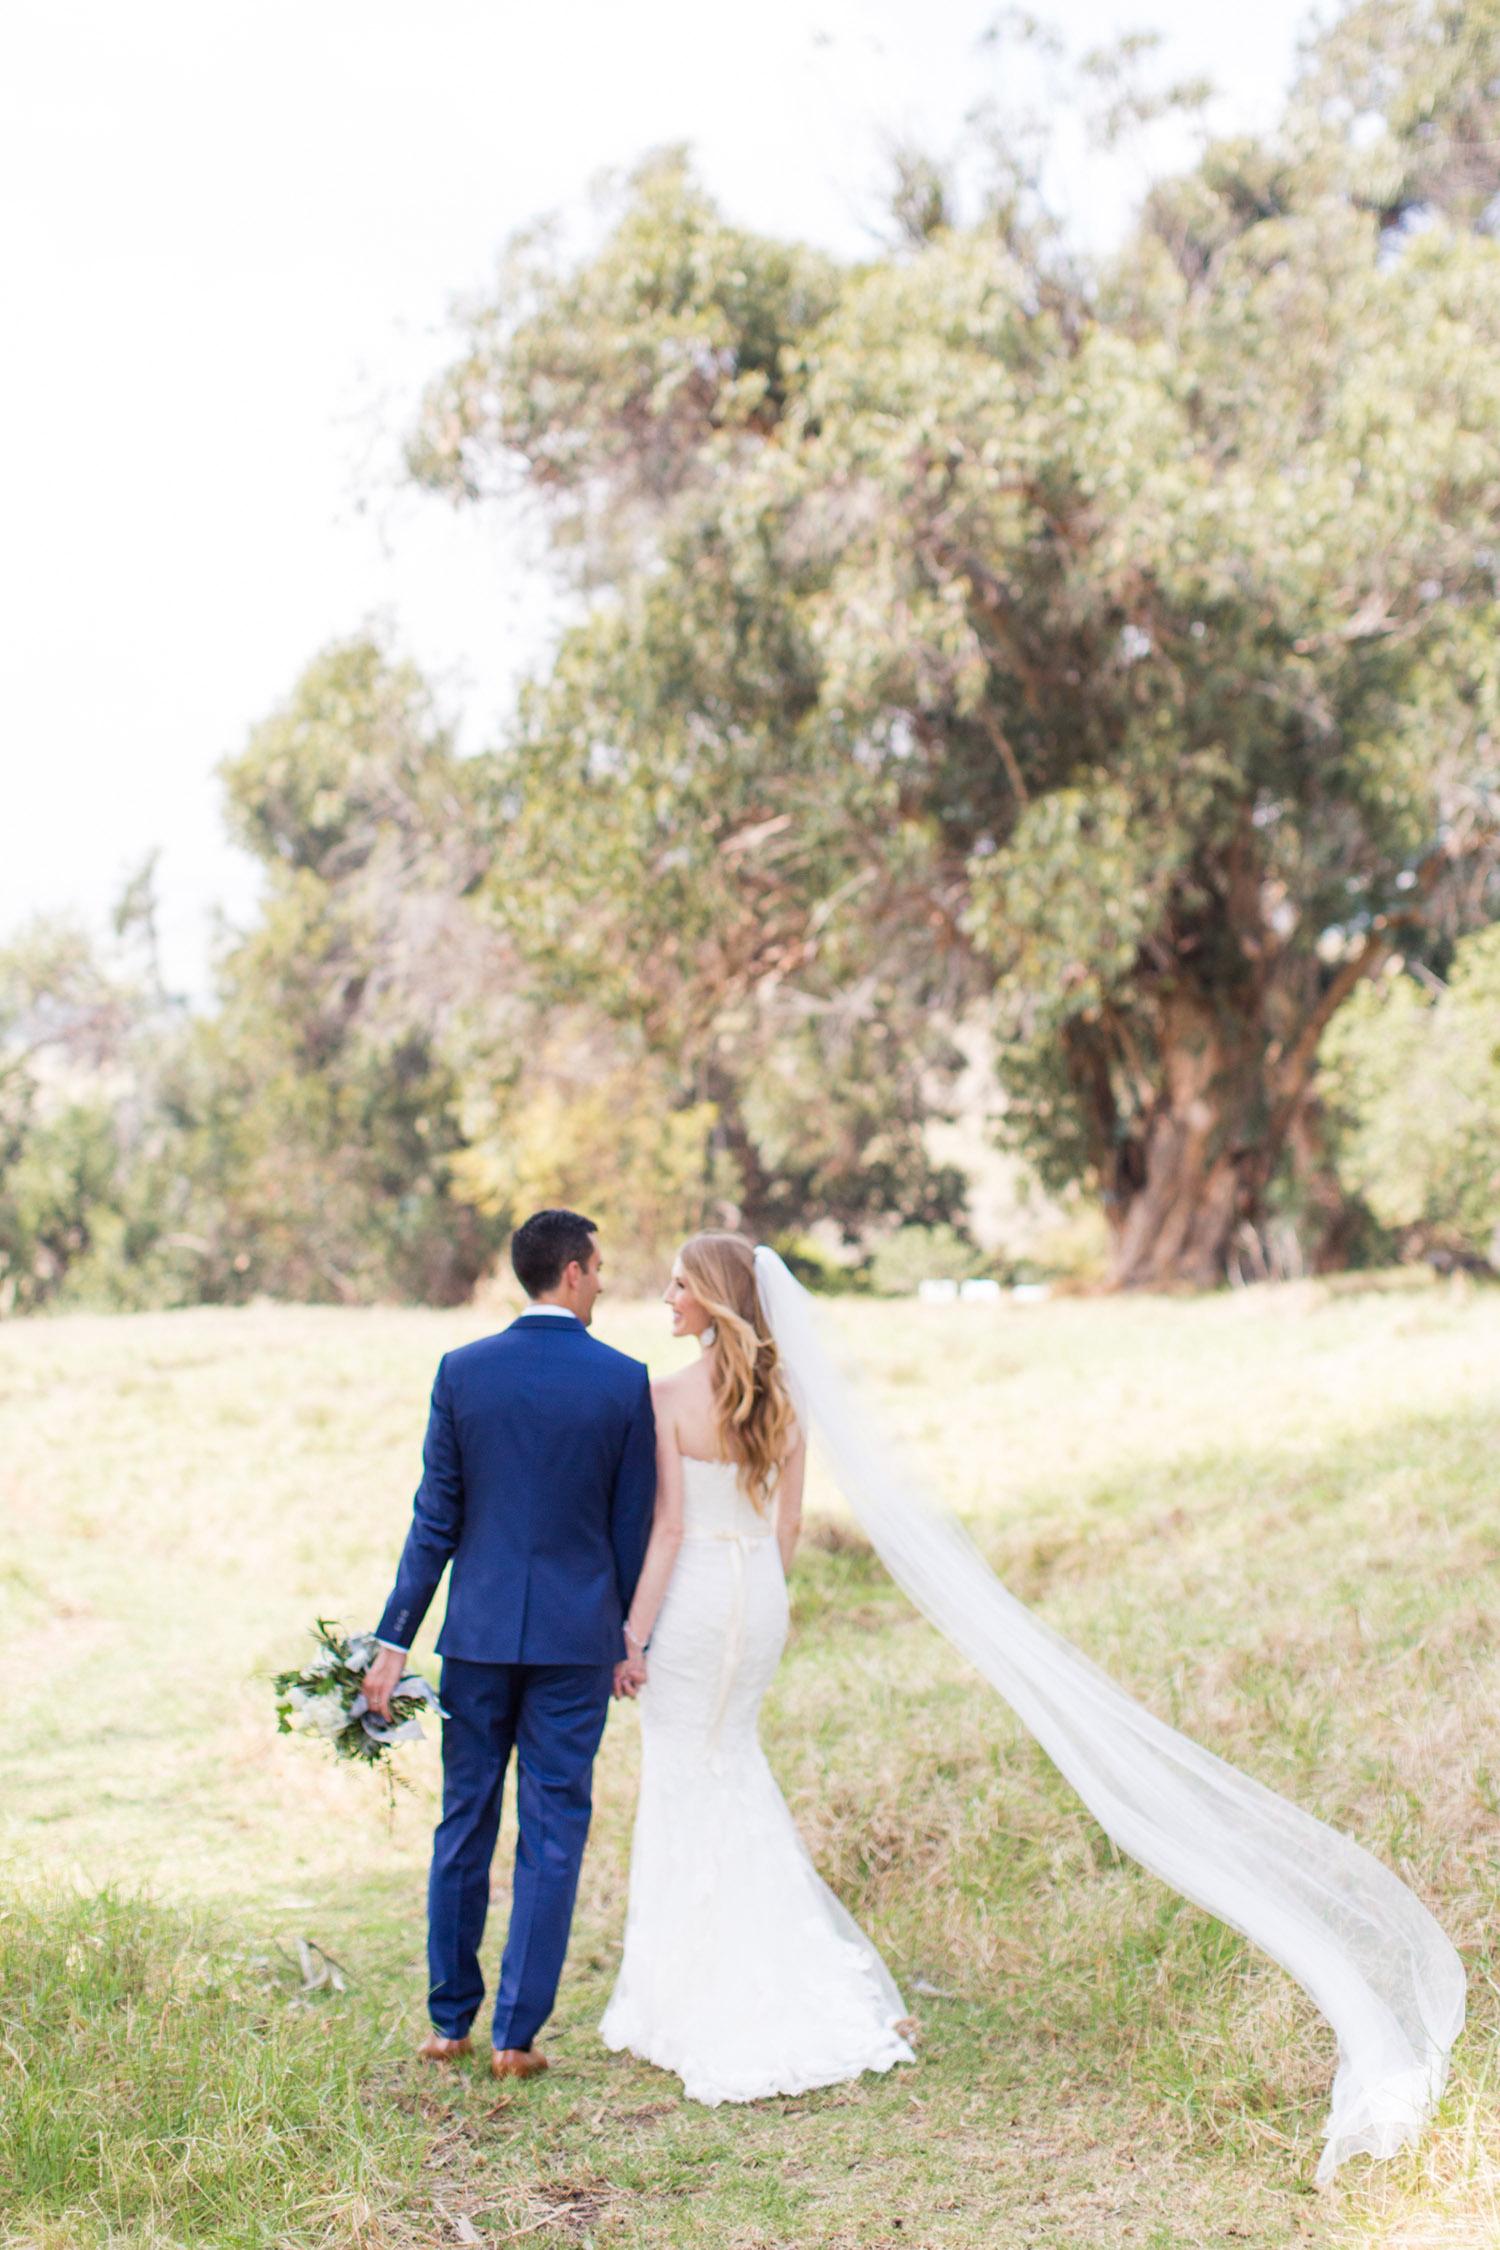 thevondys.com | Anna Heritage Ranch | Hawaii Destination Wedding Photographer | The Vondys